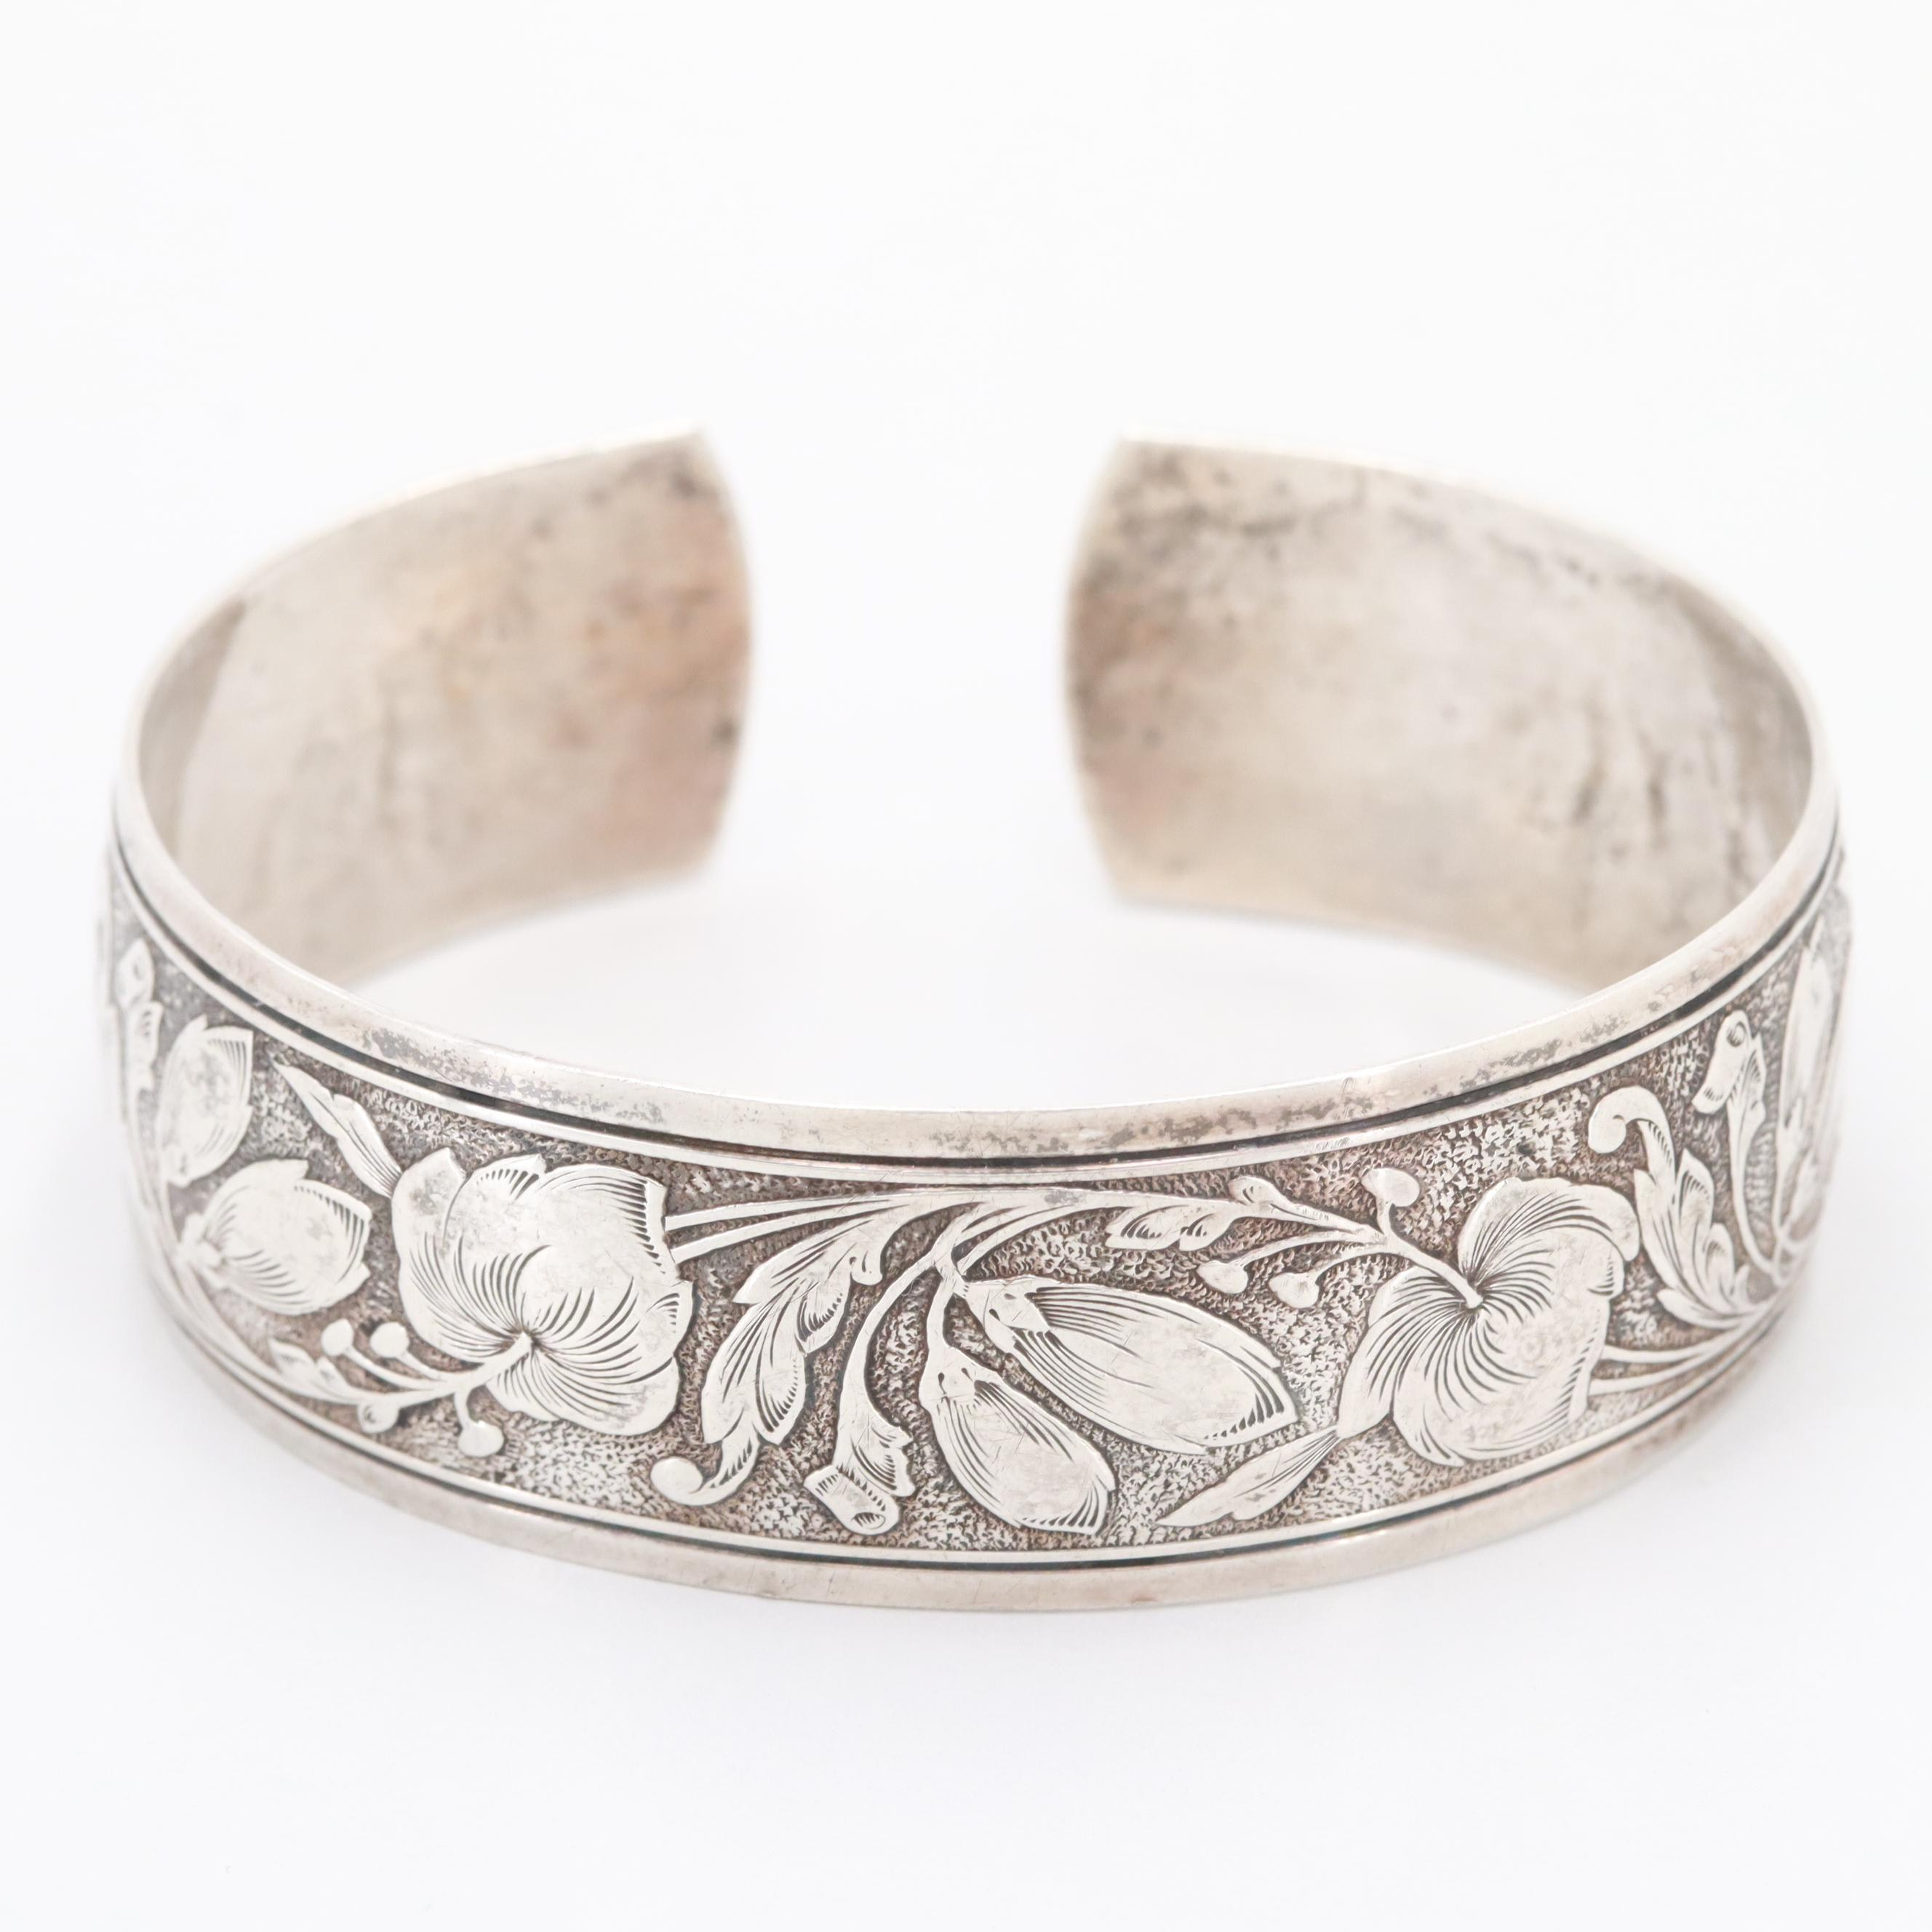 Danecraft Sterling Silver Floral Embossed Cuff Bracelet